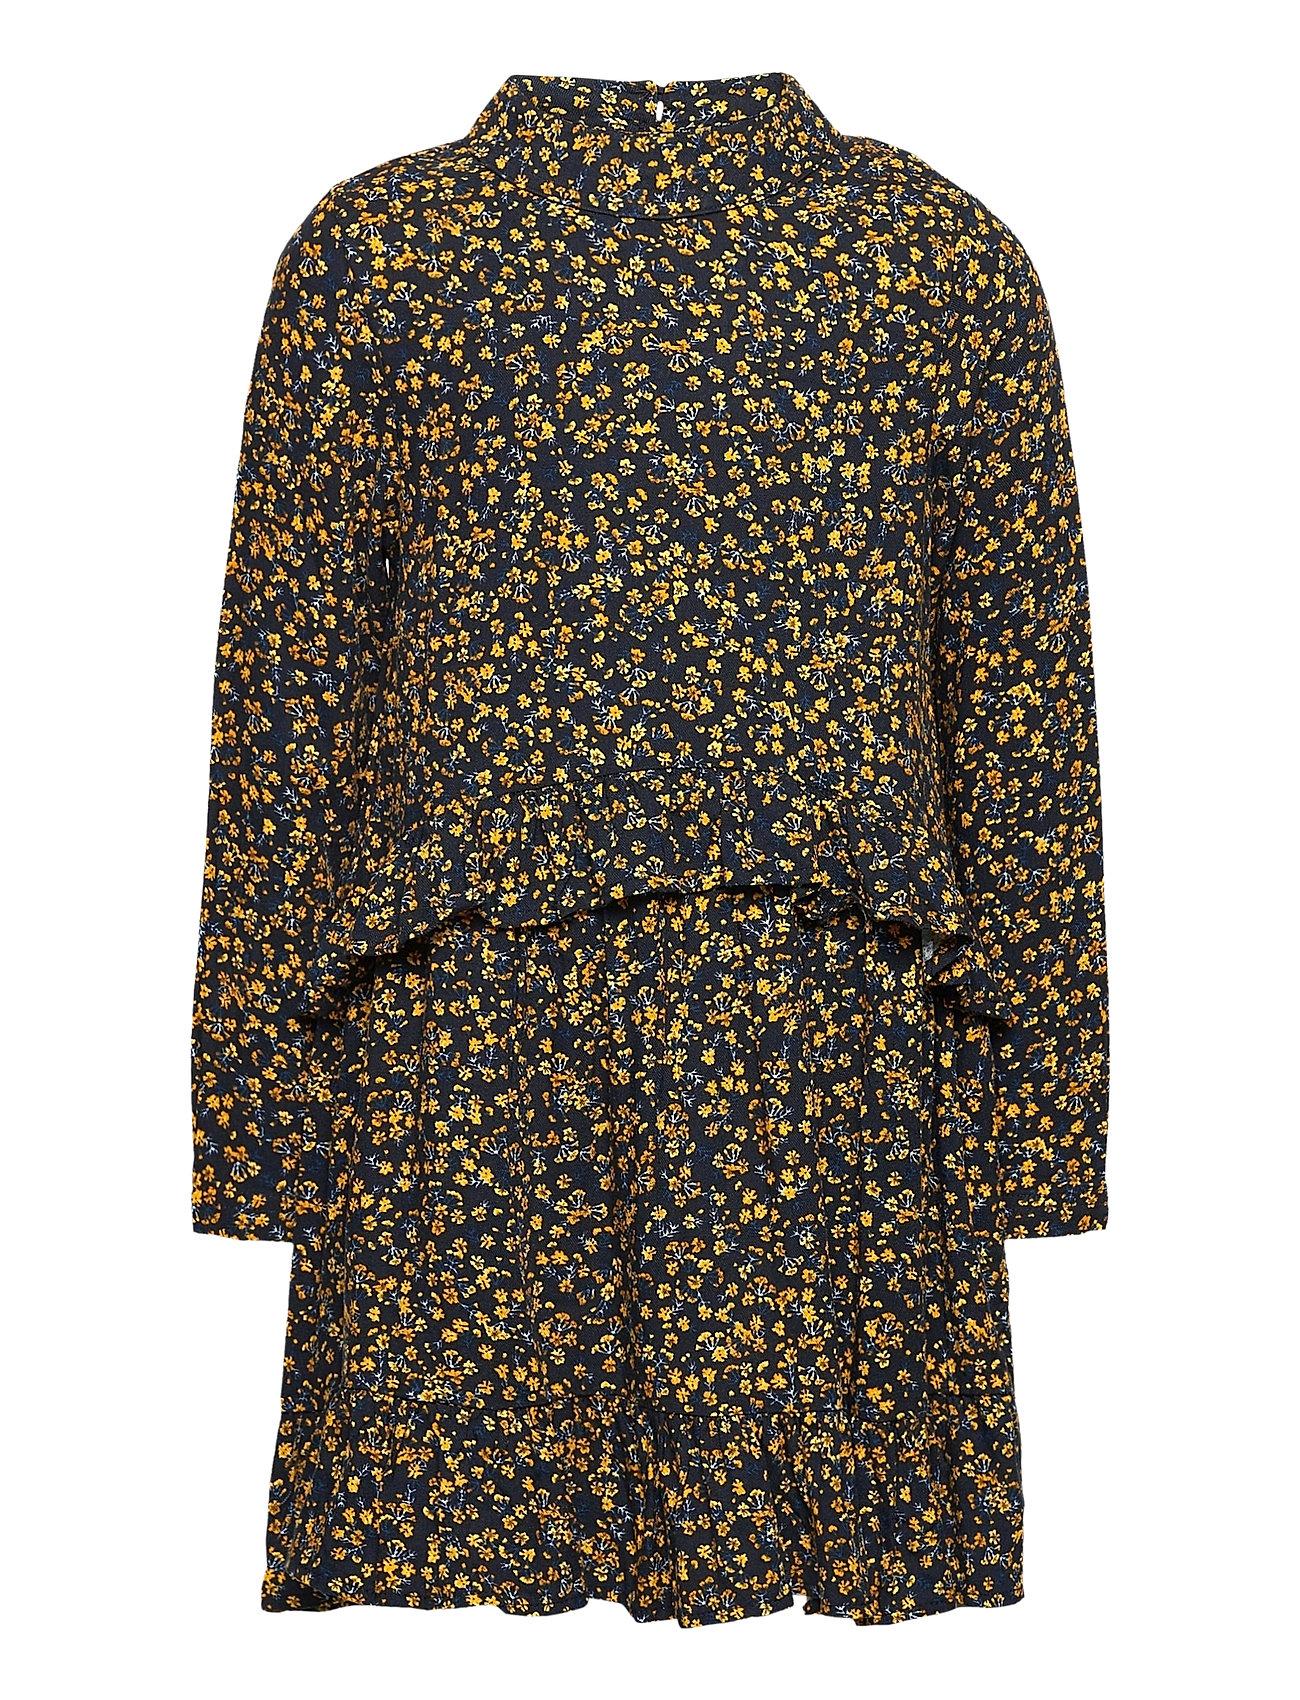 Image of Nkftrue Ls Dress Kjole Blå Name It (3479678713)